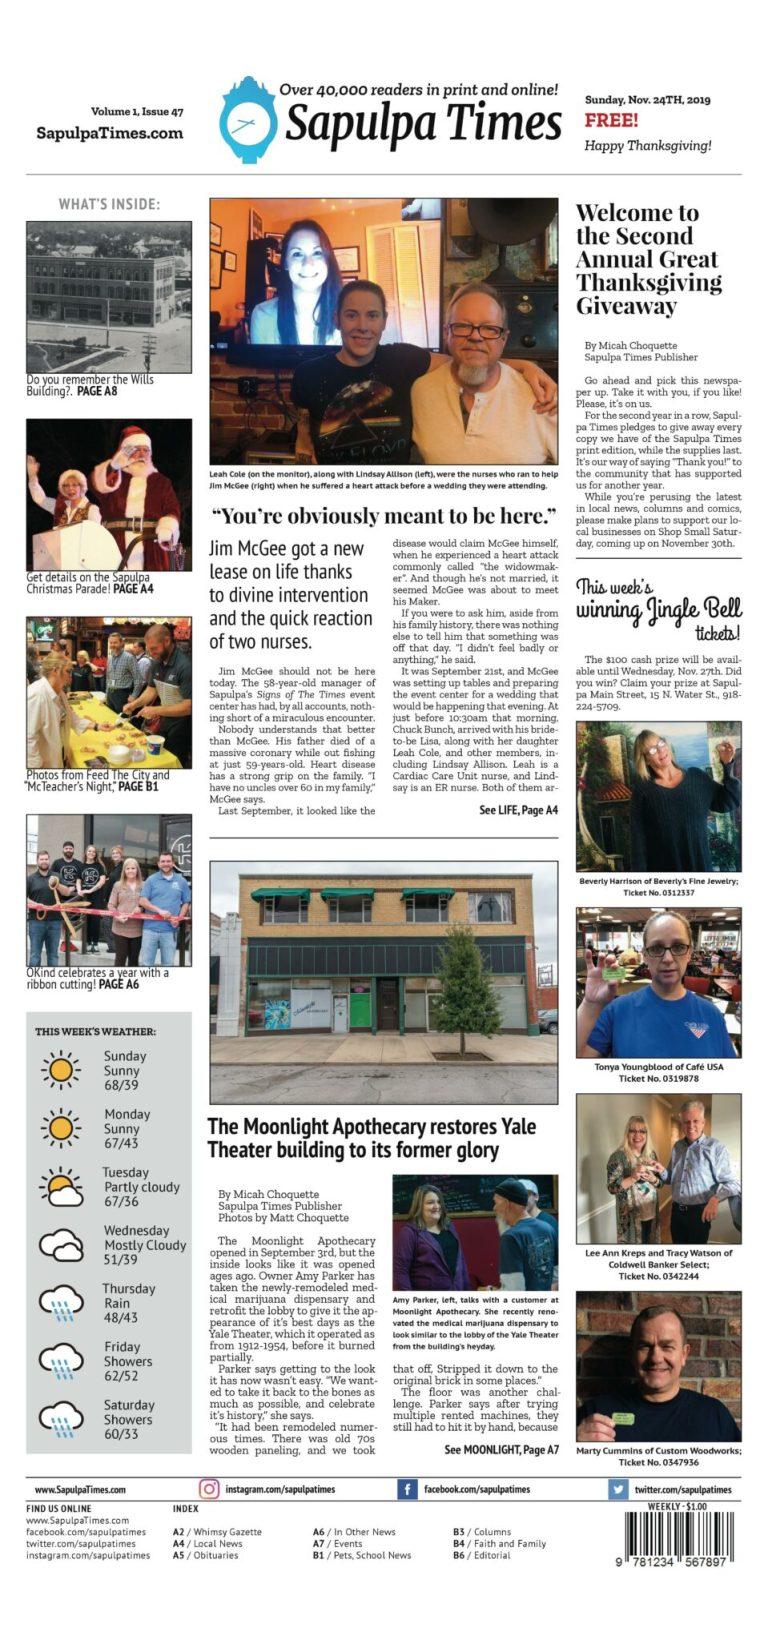 Sapulpa Times Digital Edition 11/24/2019